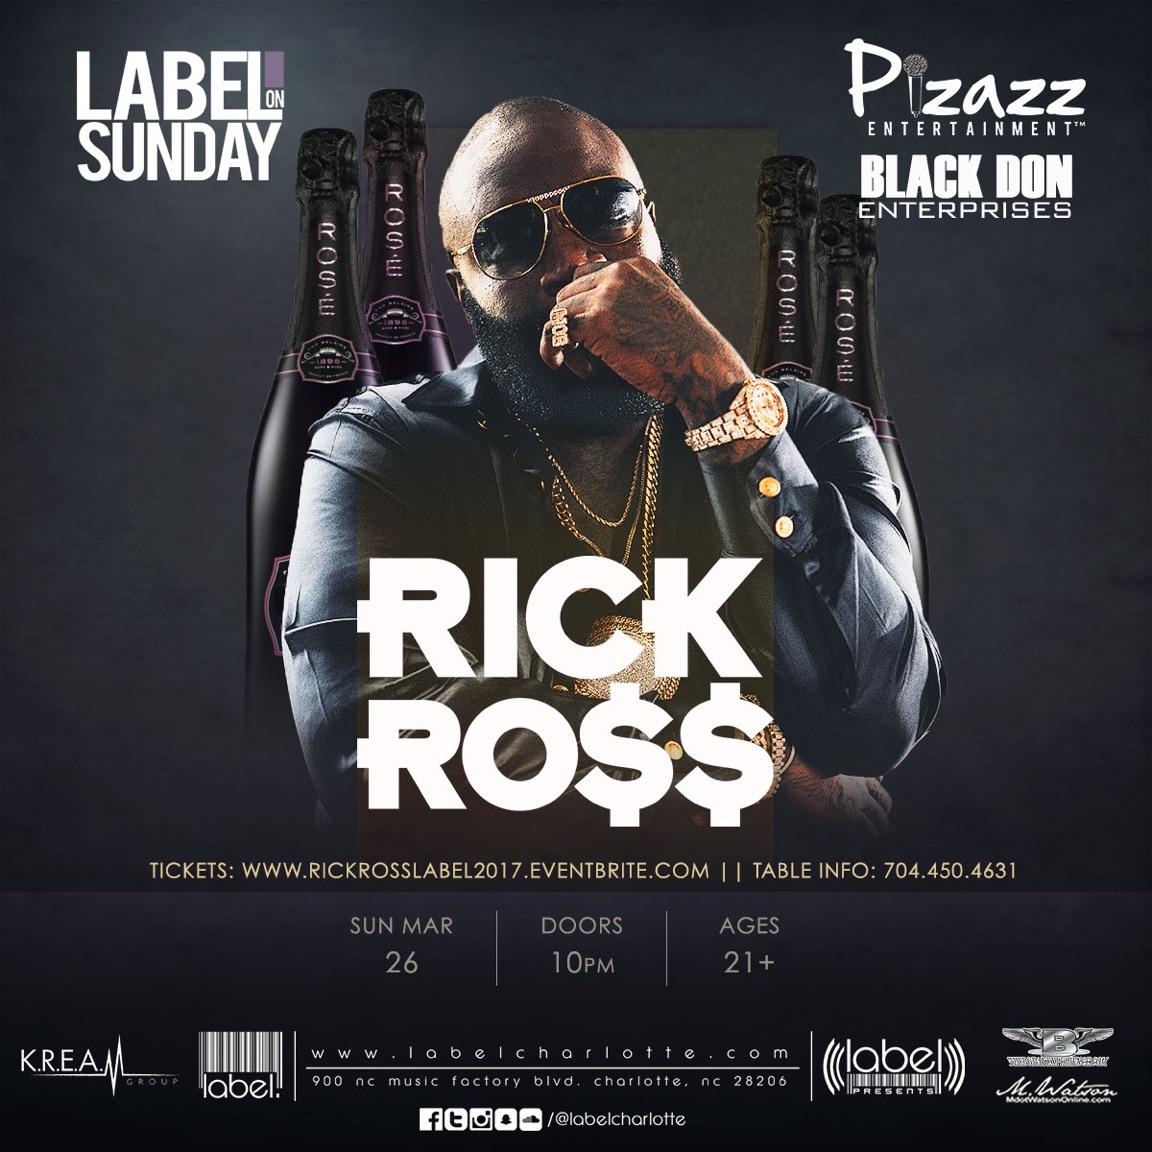 RICK ROSS DA BO$$ LIVE AT LABEL ON SUNDAY